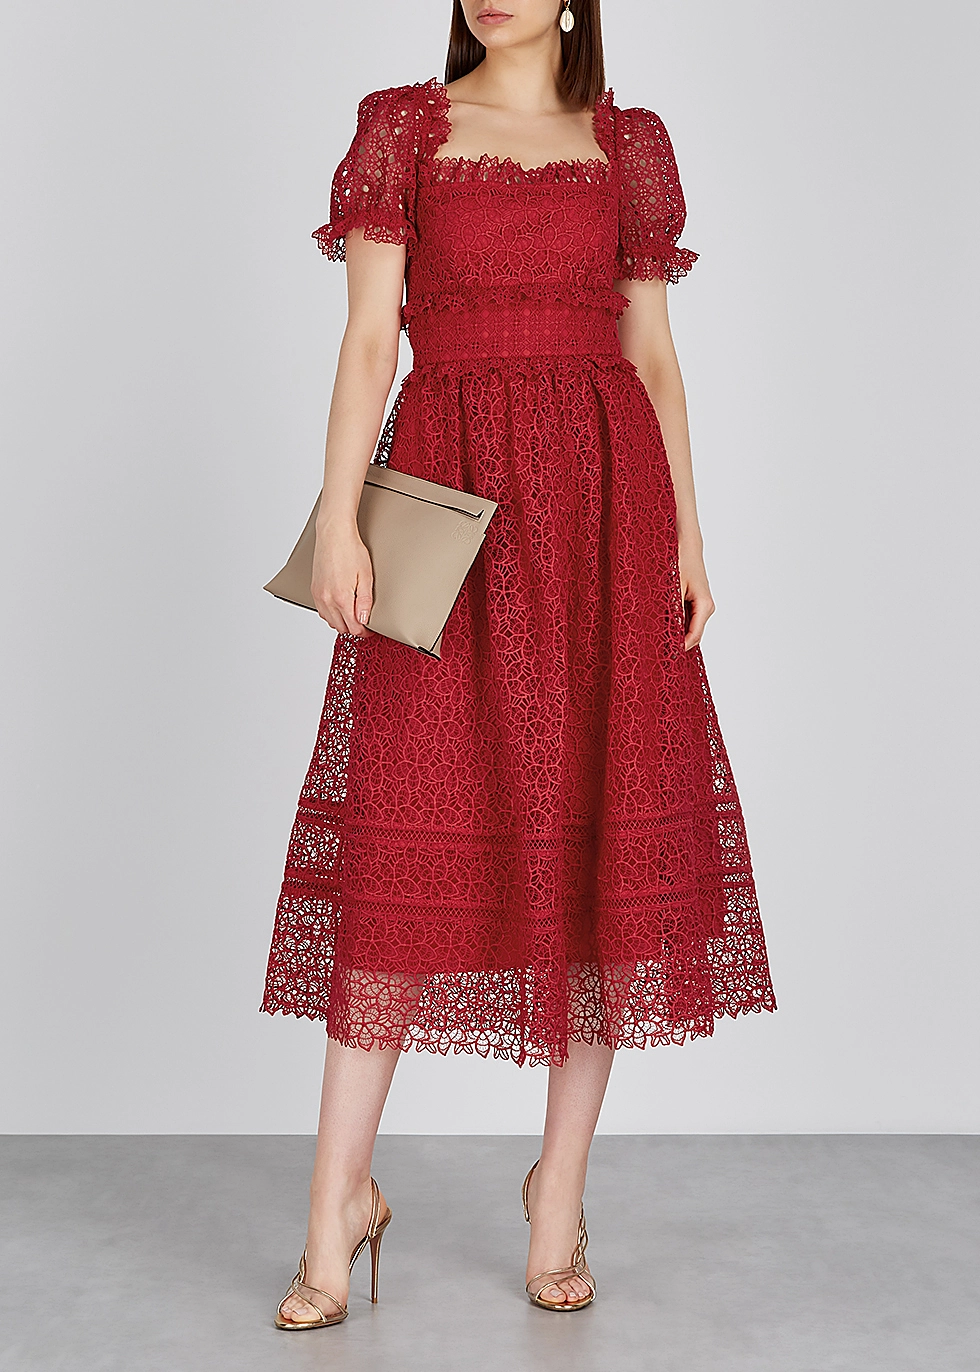 Self Portrait Guipure Red Lace Midi Dress Harvey Nichols Lace Summer Dresses Red Lace Midi Dress Lace Fashion [ 1372 x 980 Pixel ]